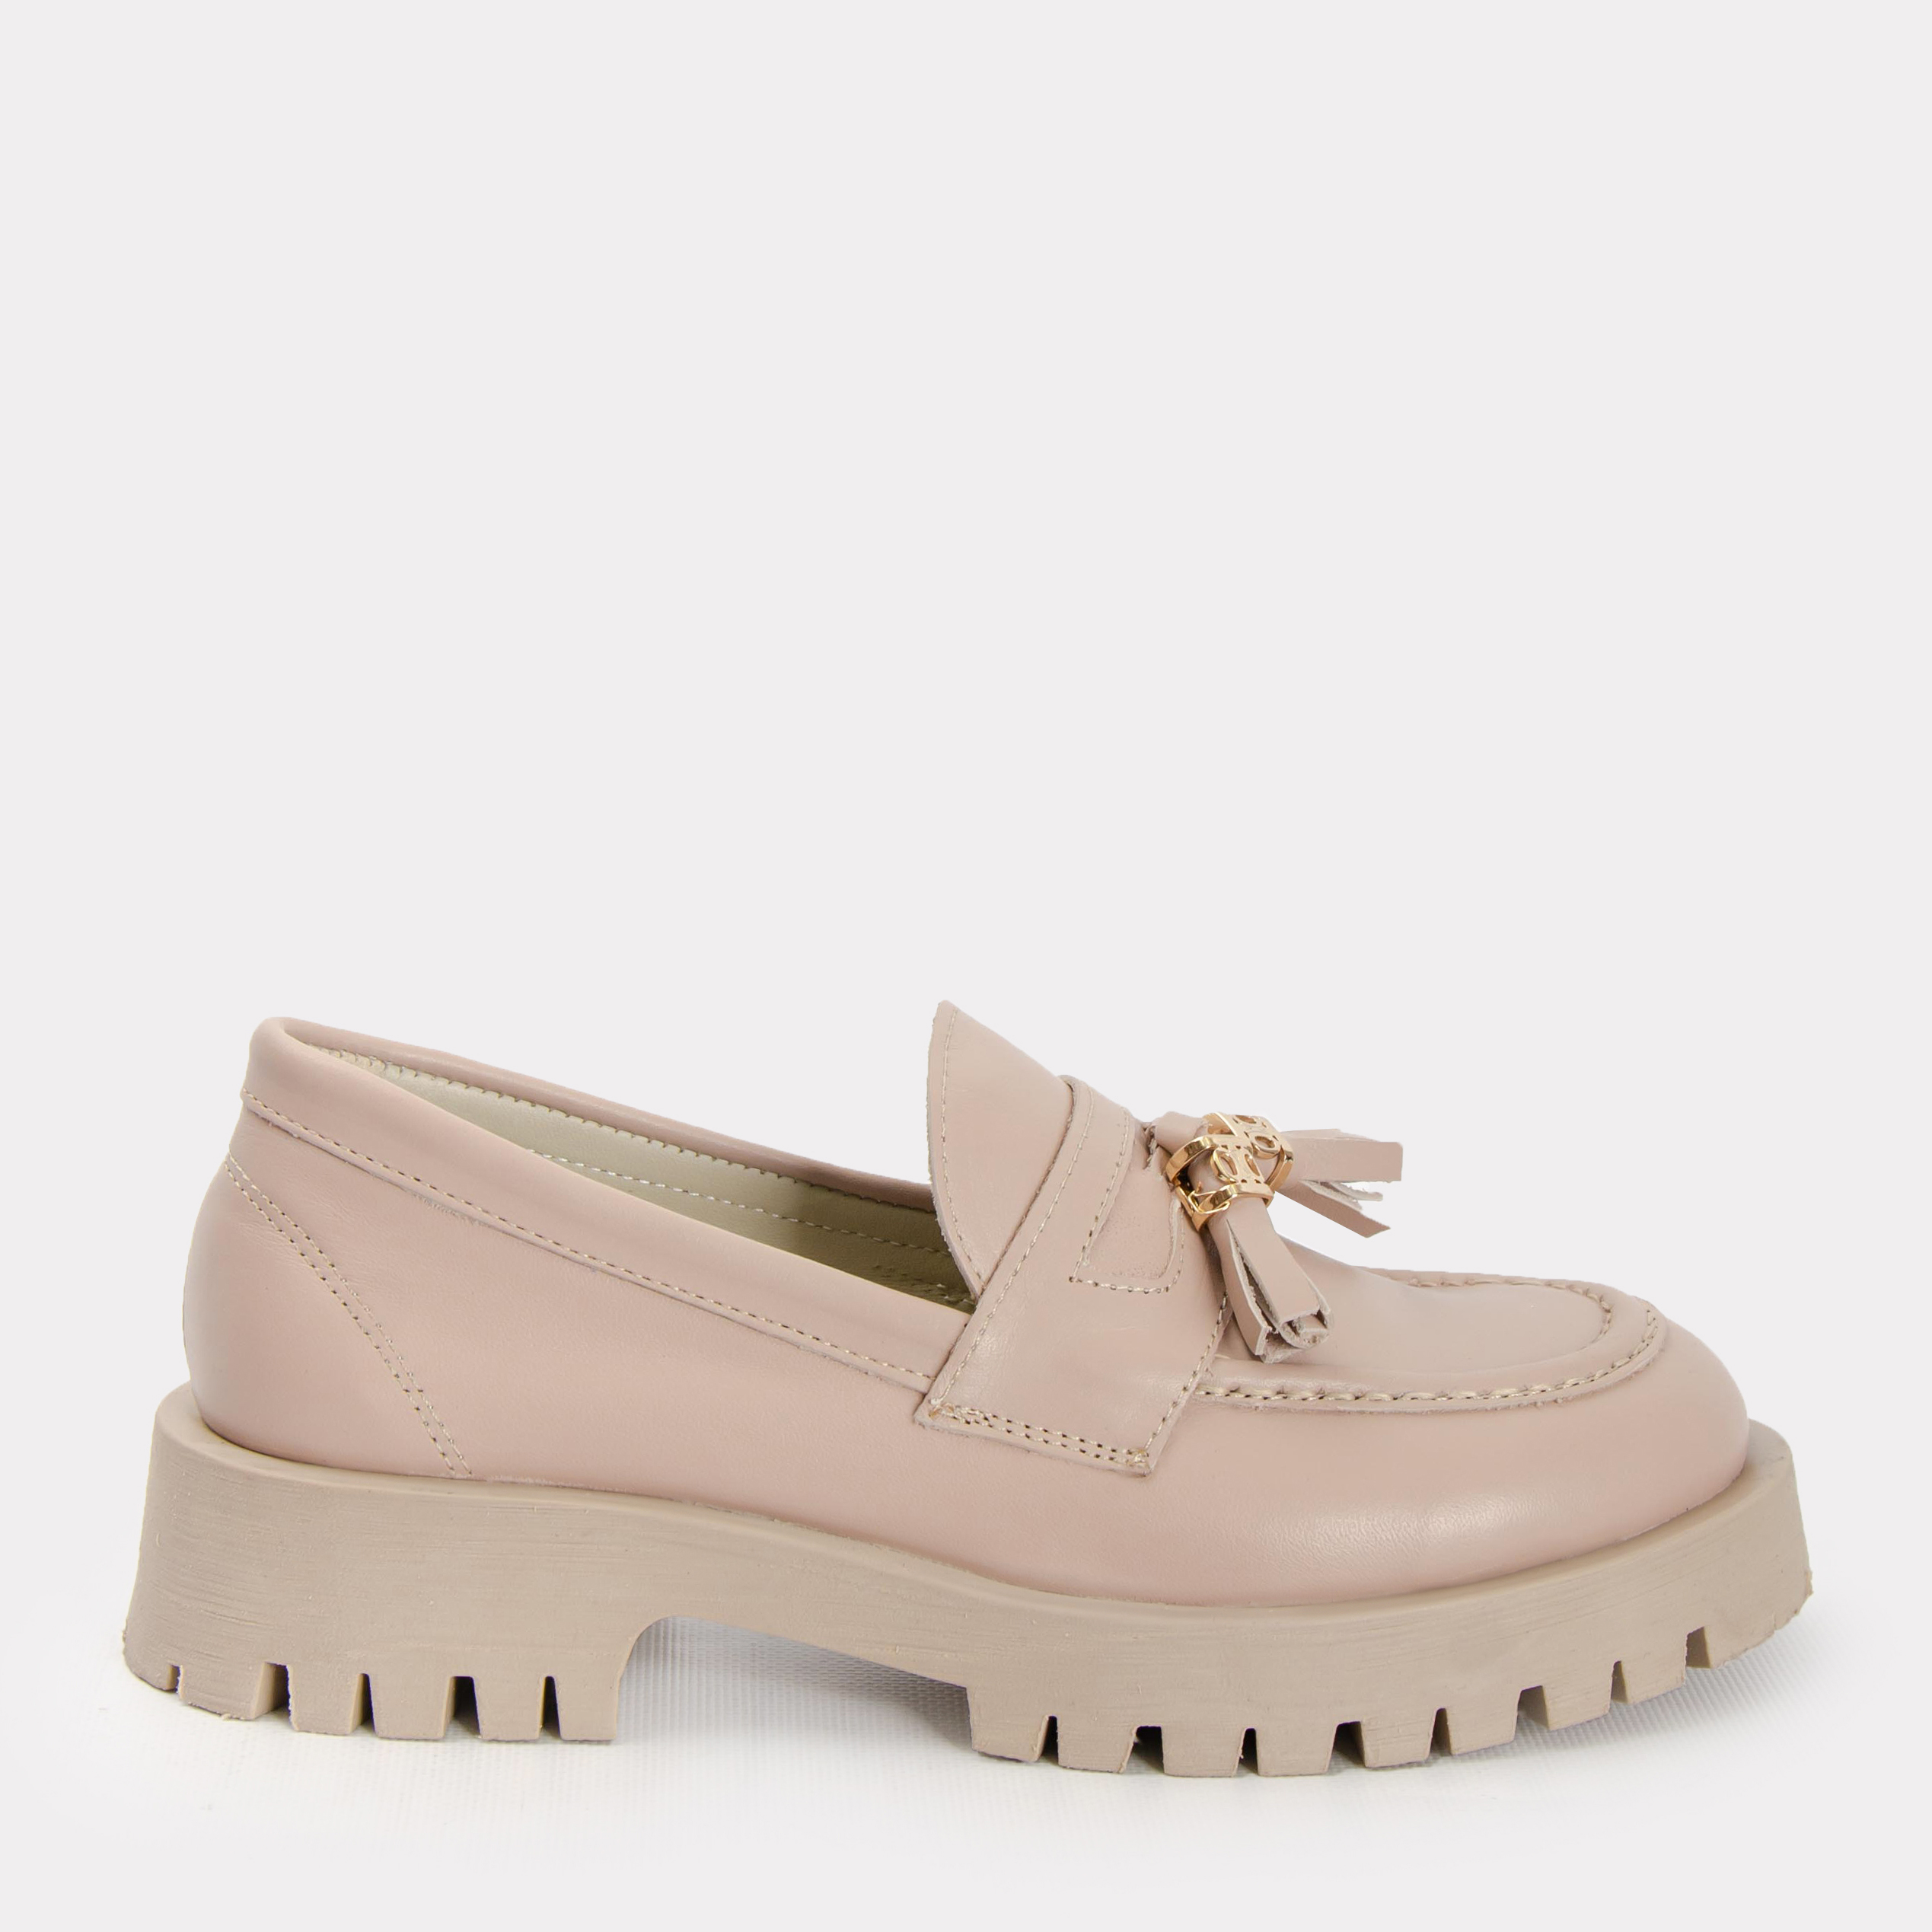 Лоферы Caruso Shoes Stacy 21-00533 39 25 см Бежевые (ROZ6400034726)